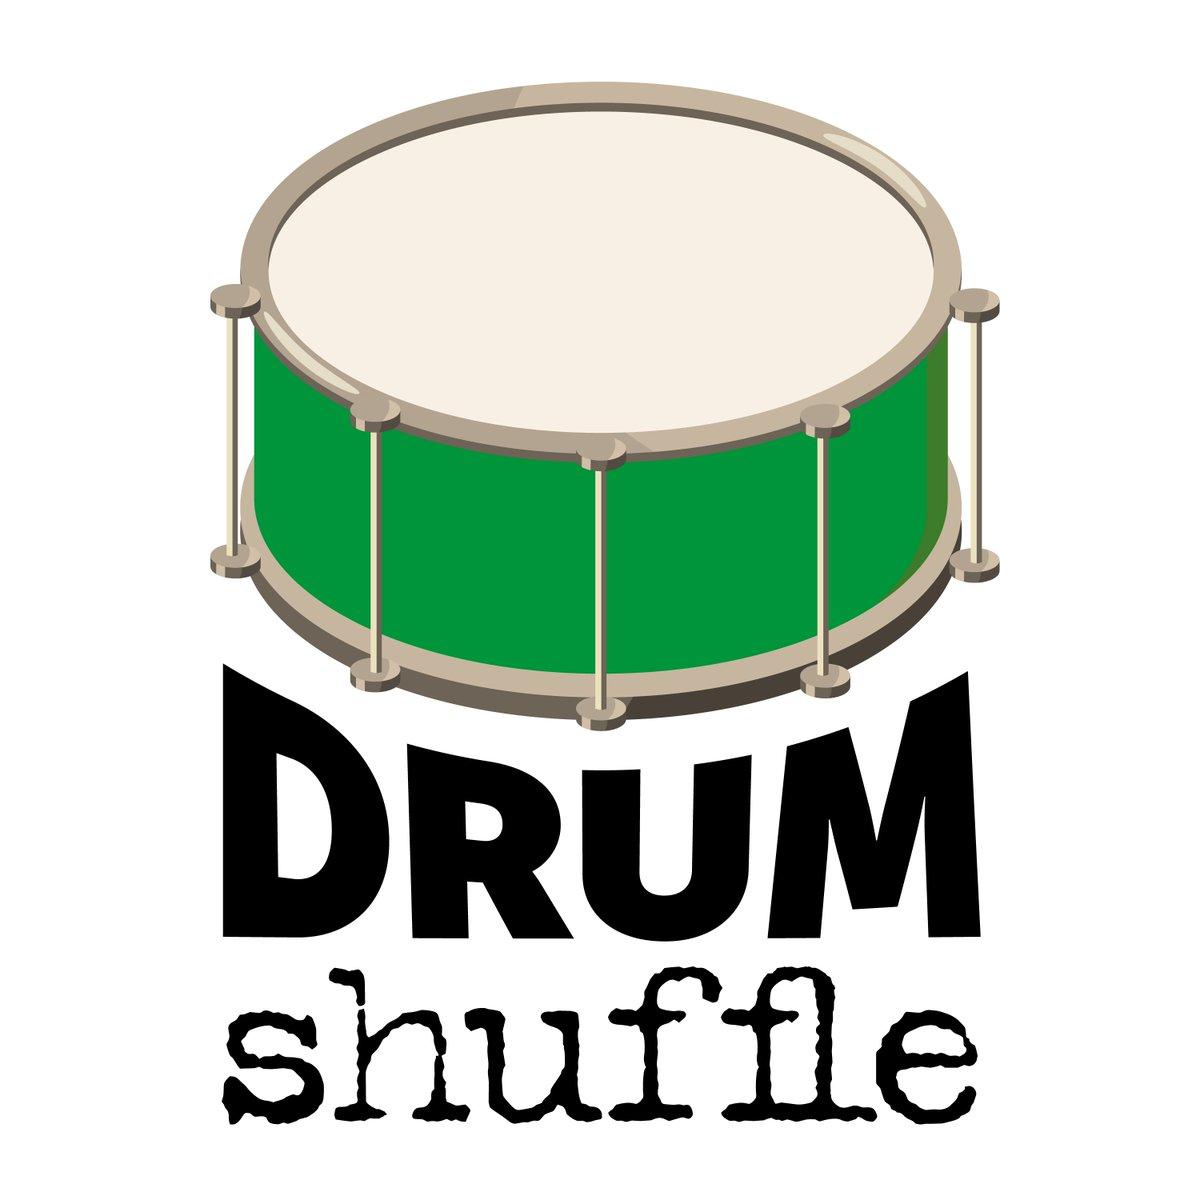 88 marching snare drum clipart snare drum or side with drumsticks musical instrument flat. Black Bedroom Furniture Sets. Home Design Ideas